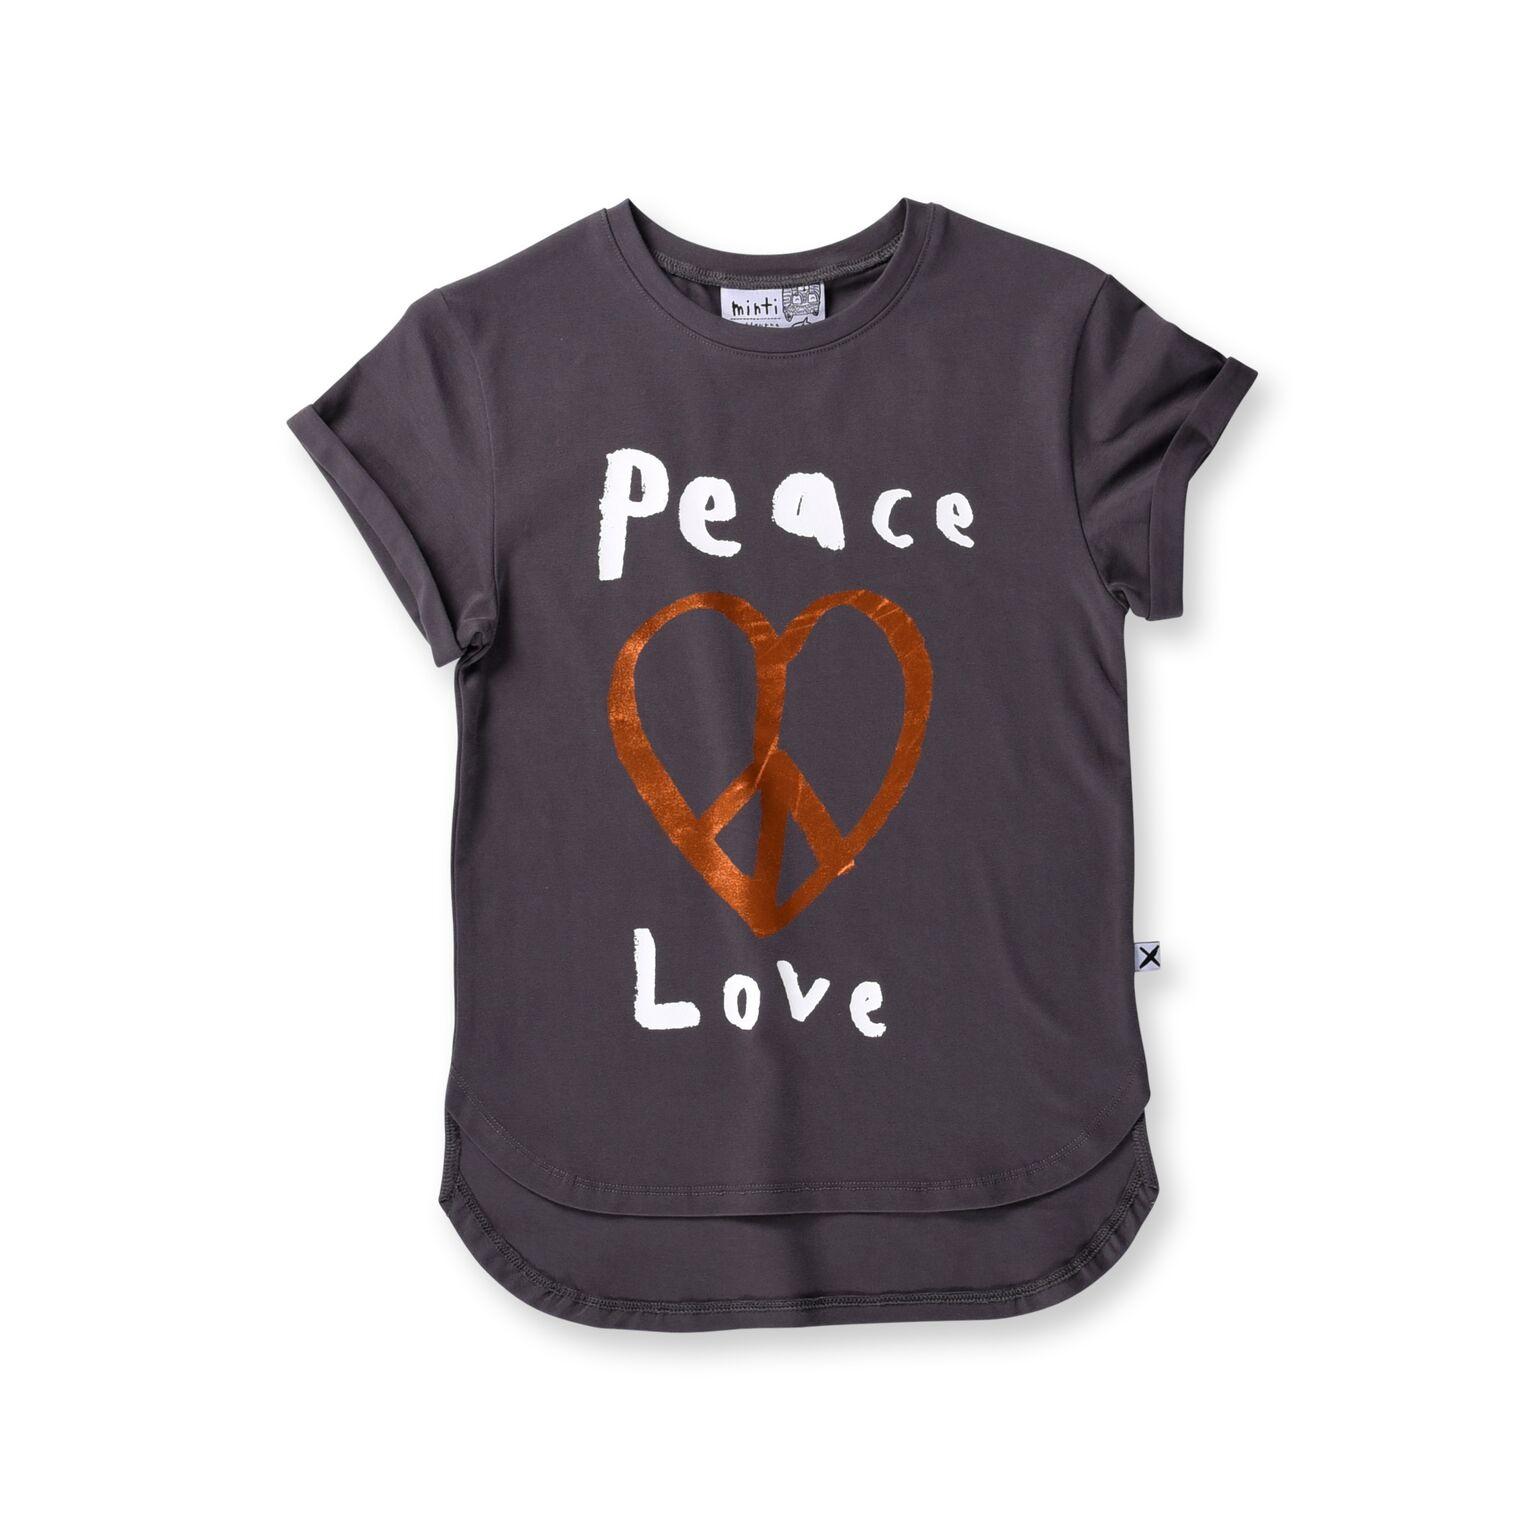 Minti Peace Love Drop Tee